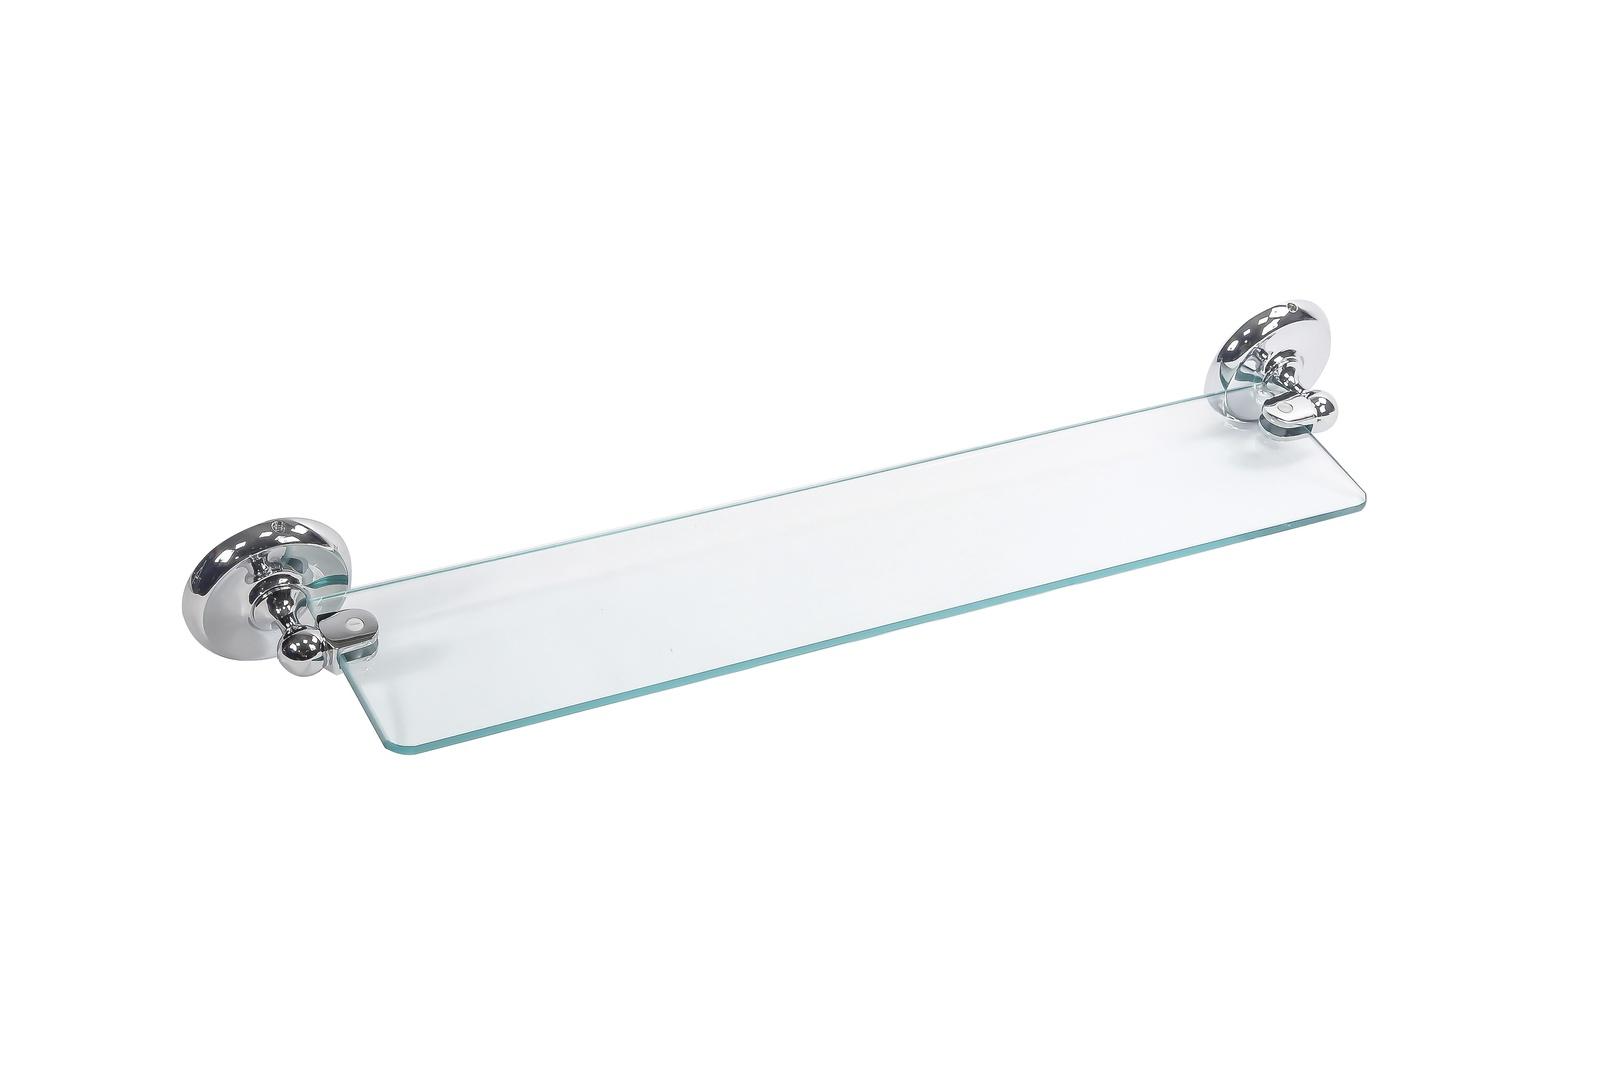 Полка для ванной комнаты BATH PLUS ST-73303 полка для ванной комнаты hiba